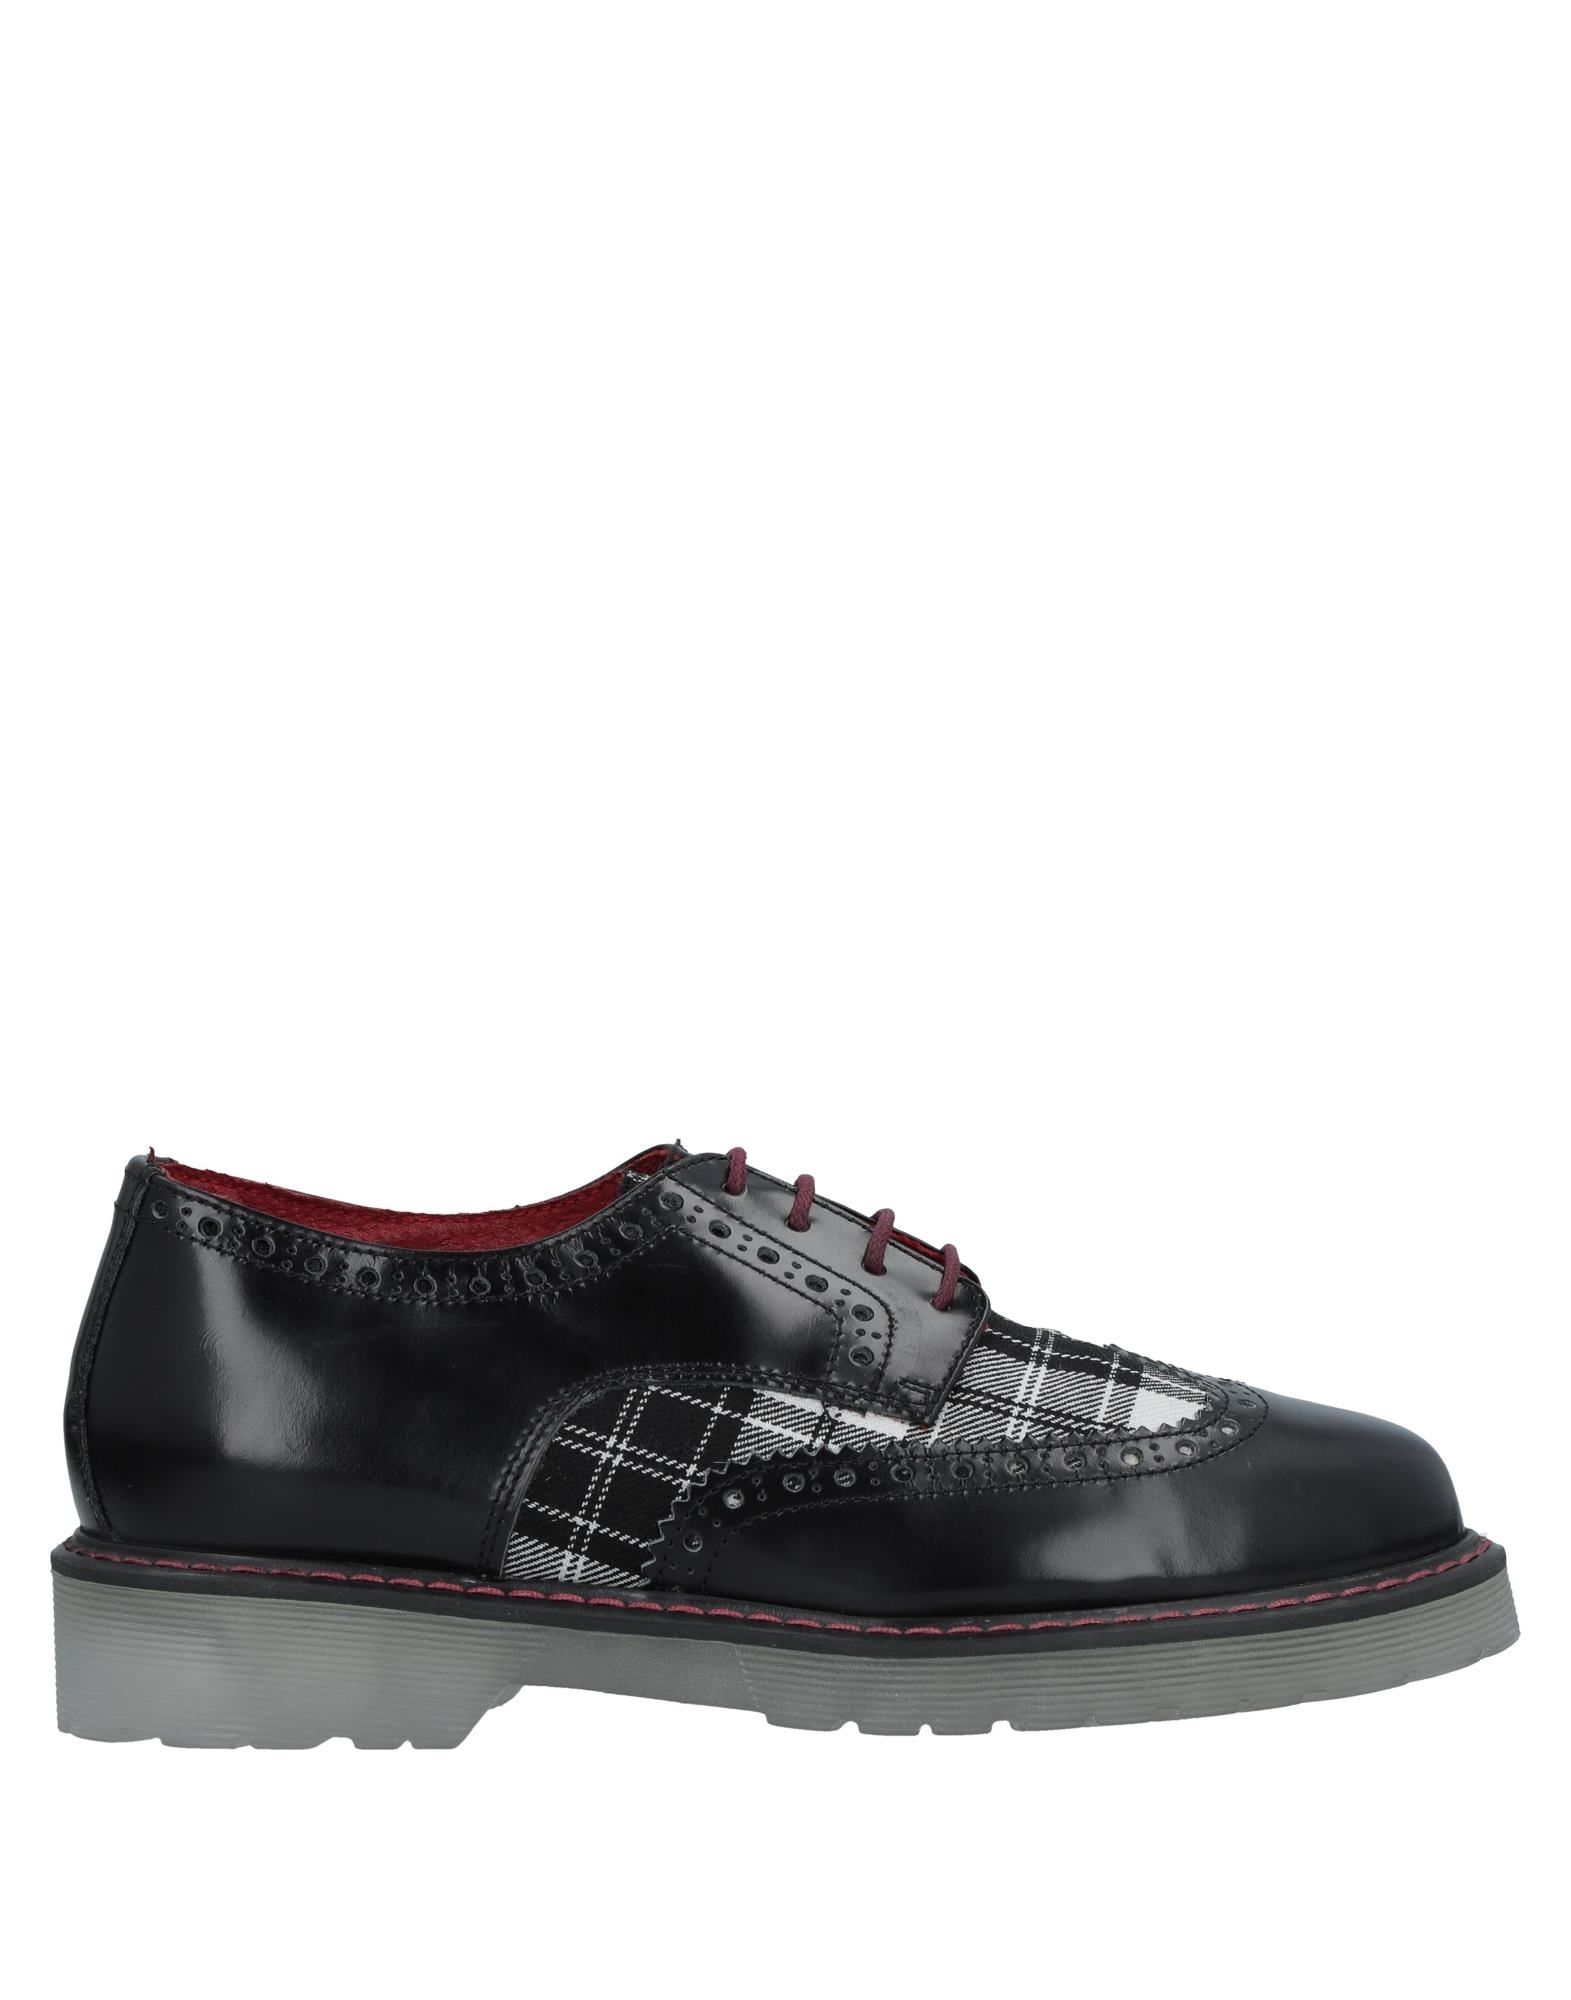 MAISON ZERO Q Обувь на шнурках цены онлайн